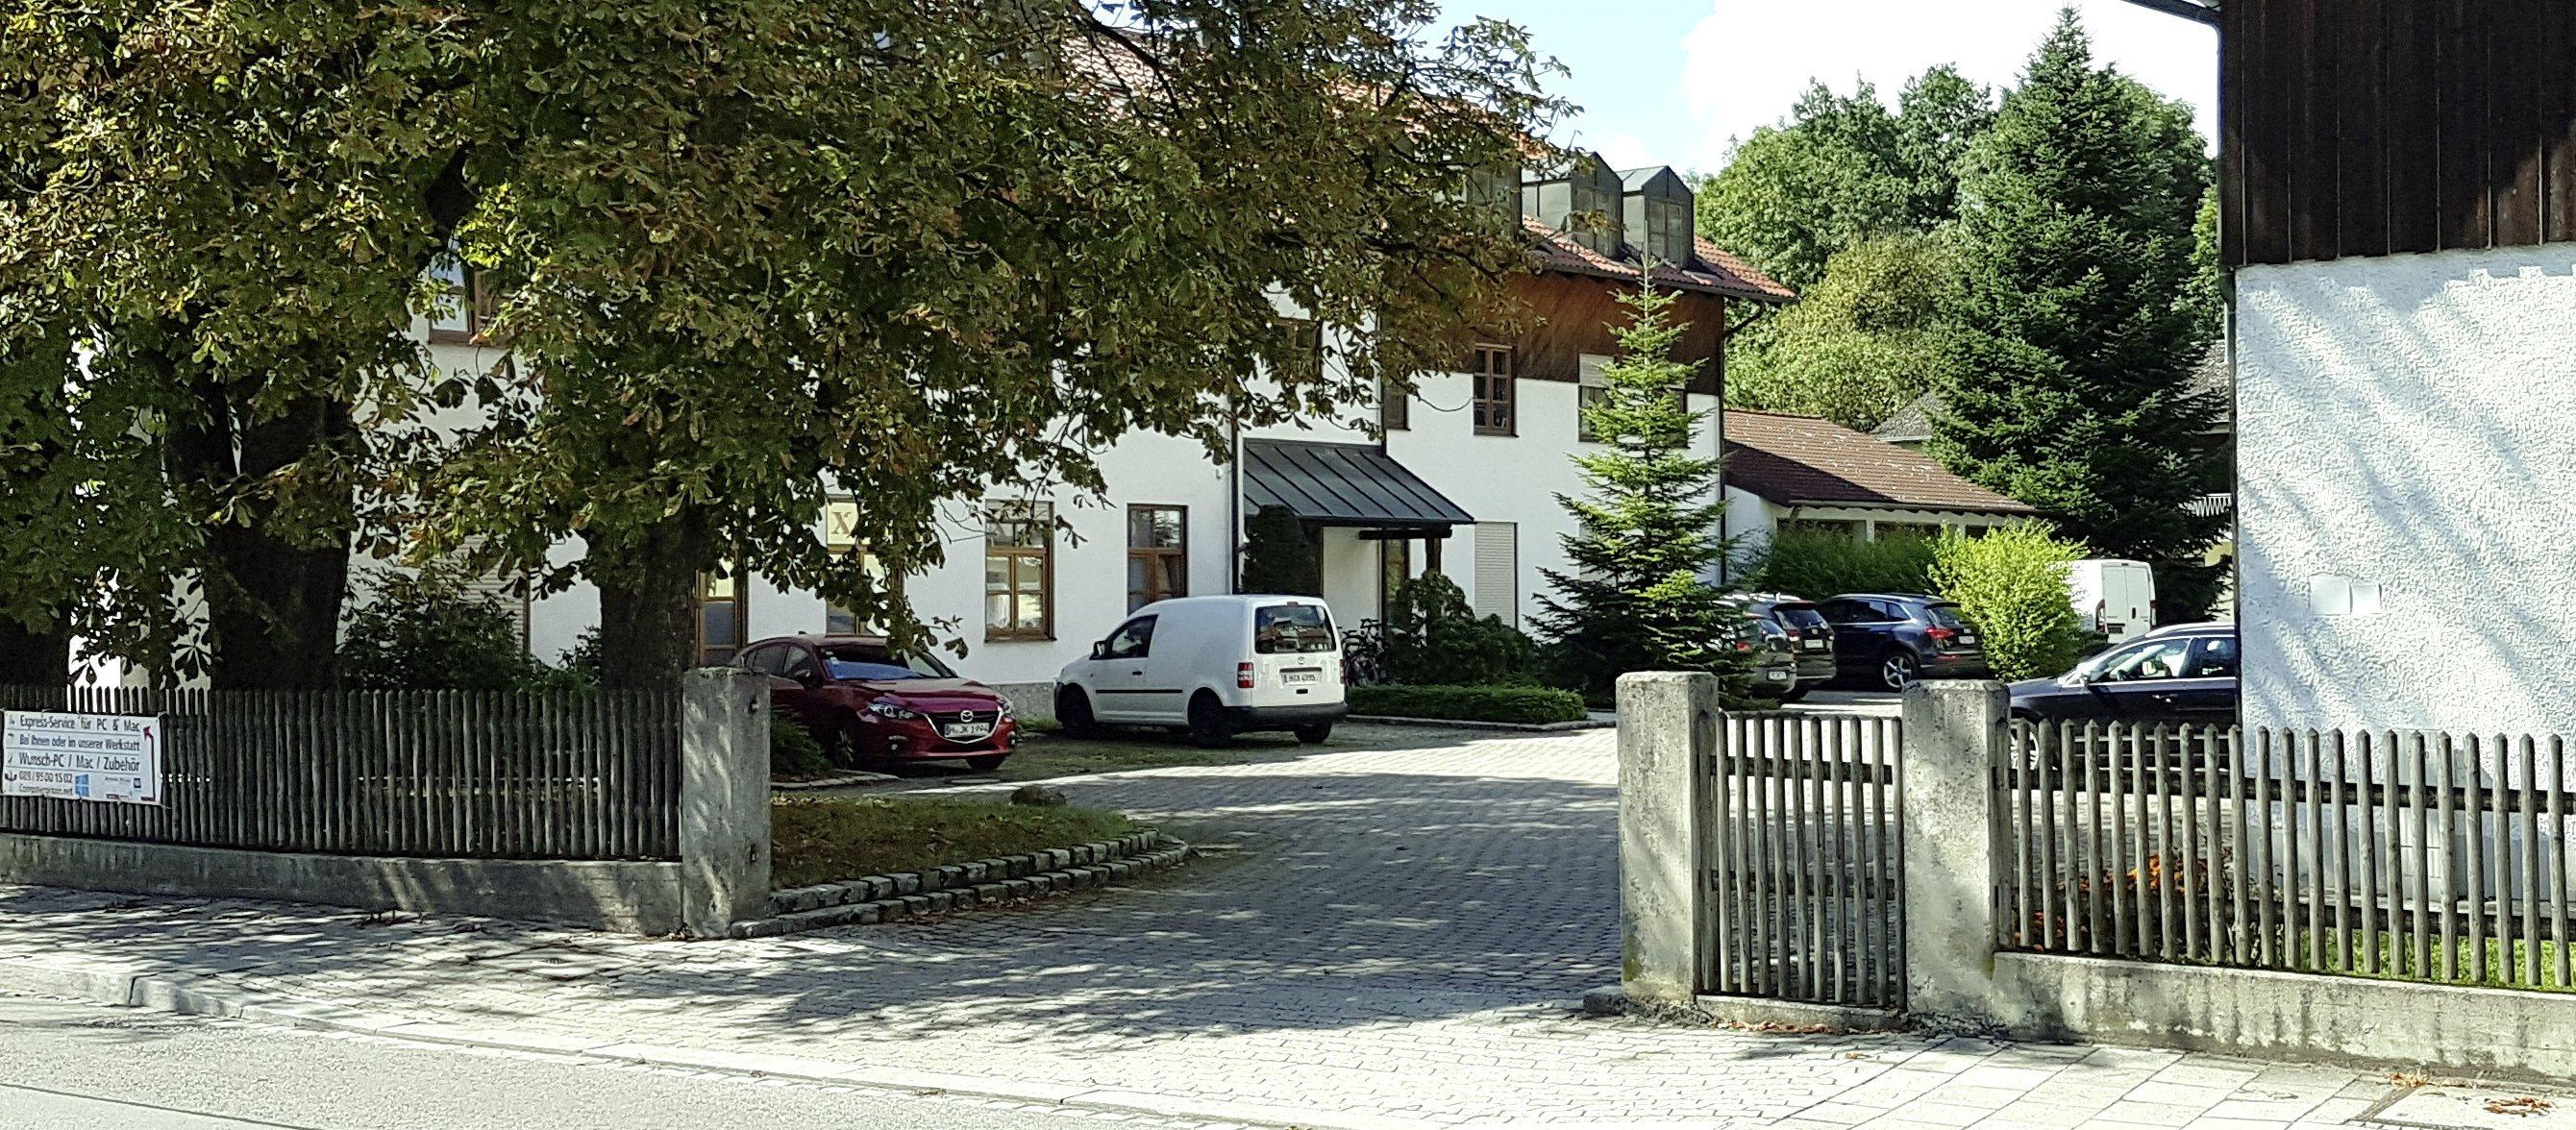 Münchner Str. 123, Unterföhring